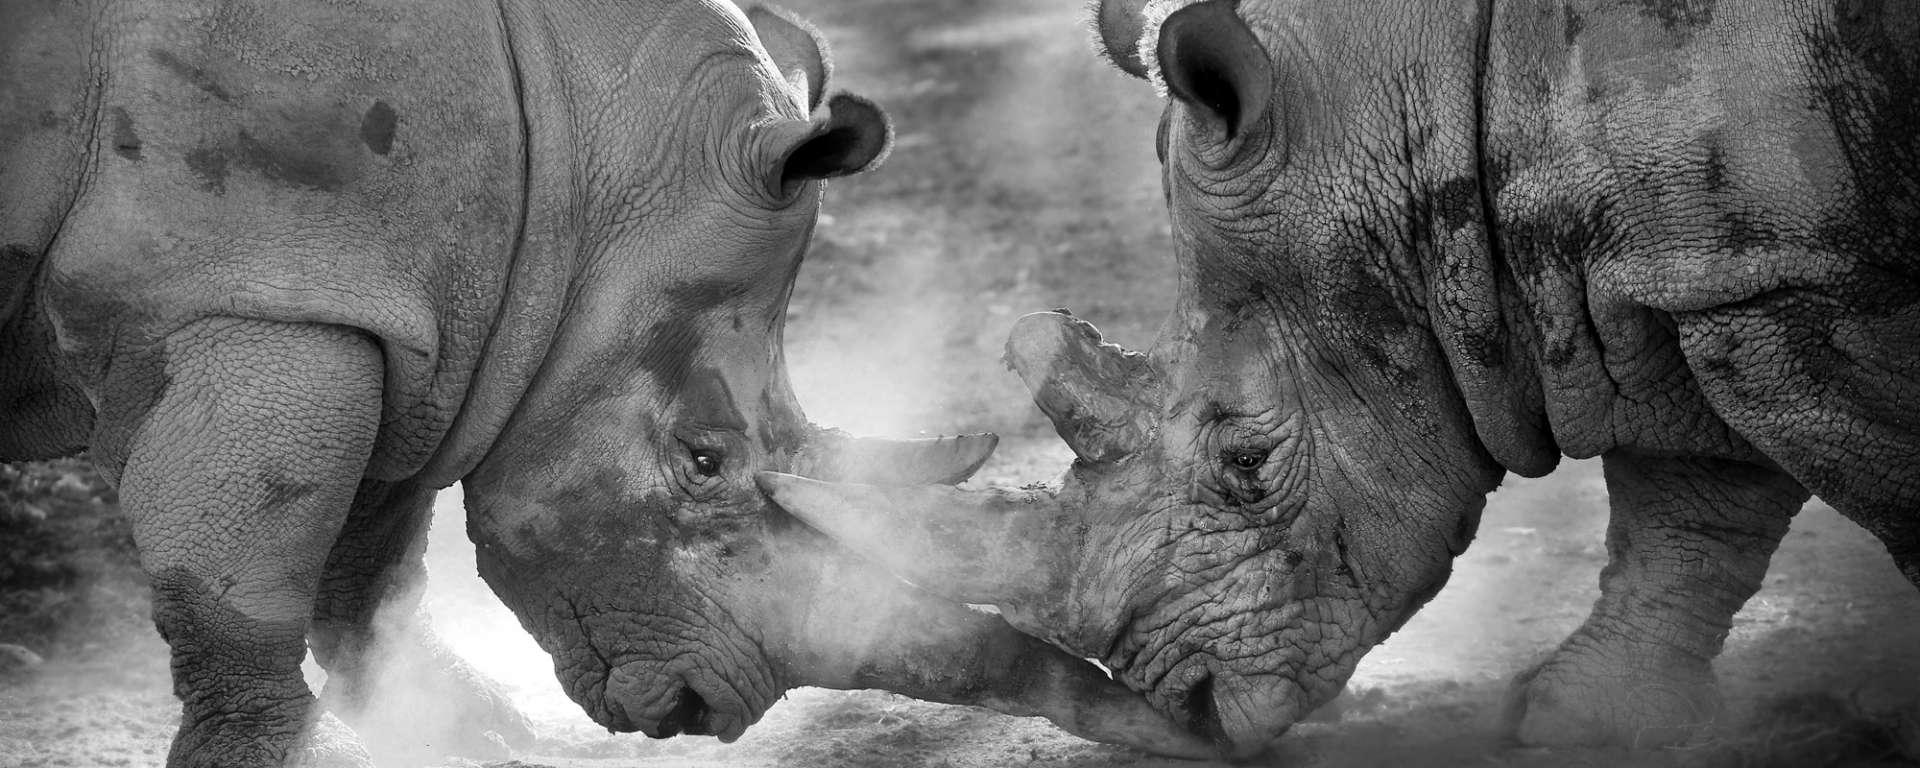 Rhinos Fighting